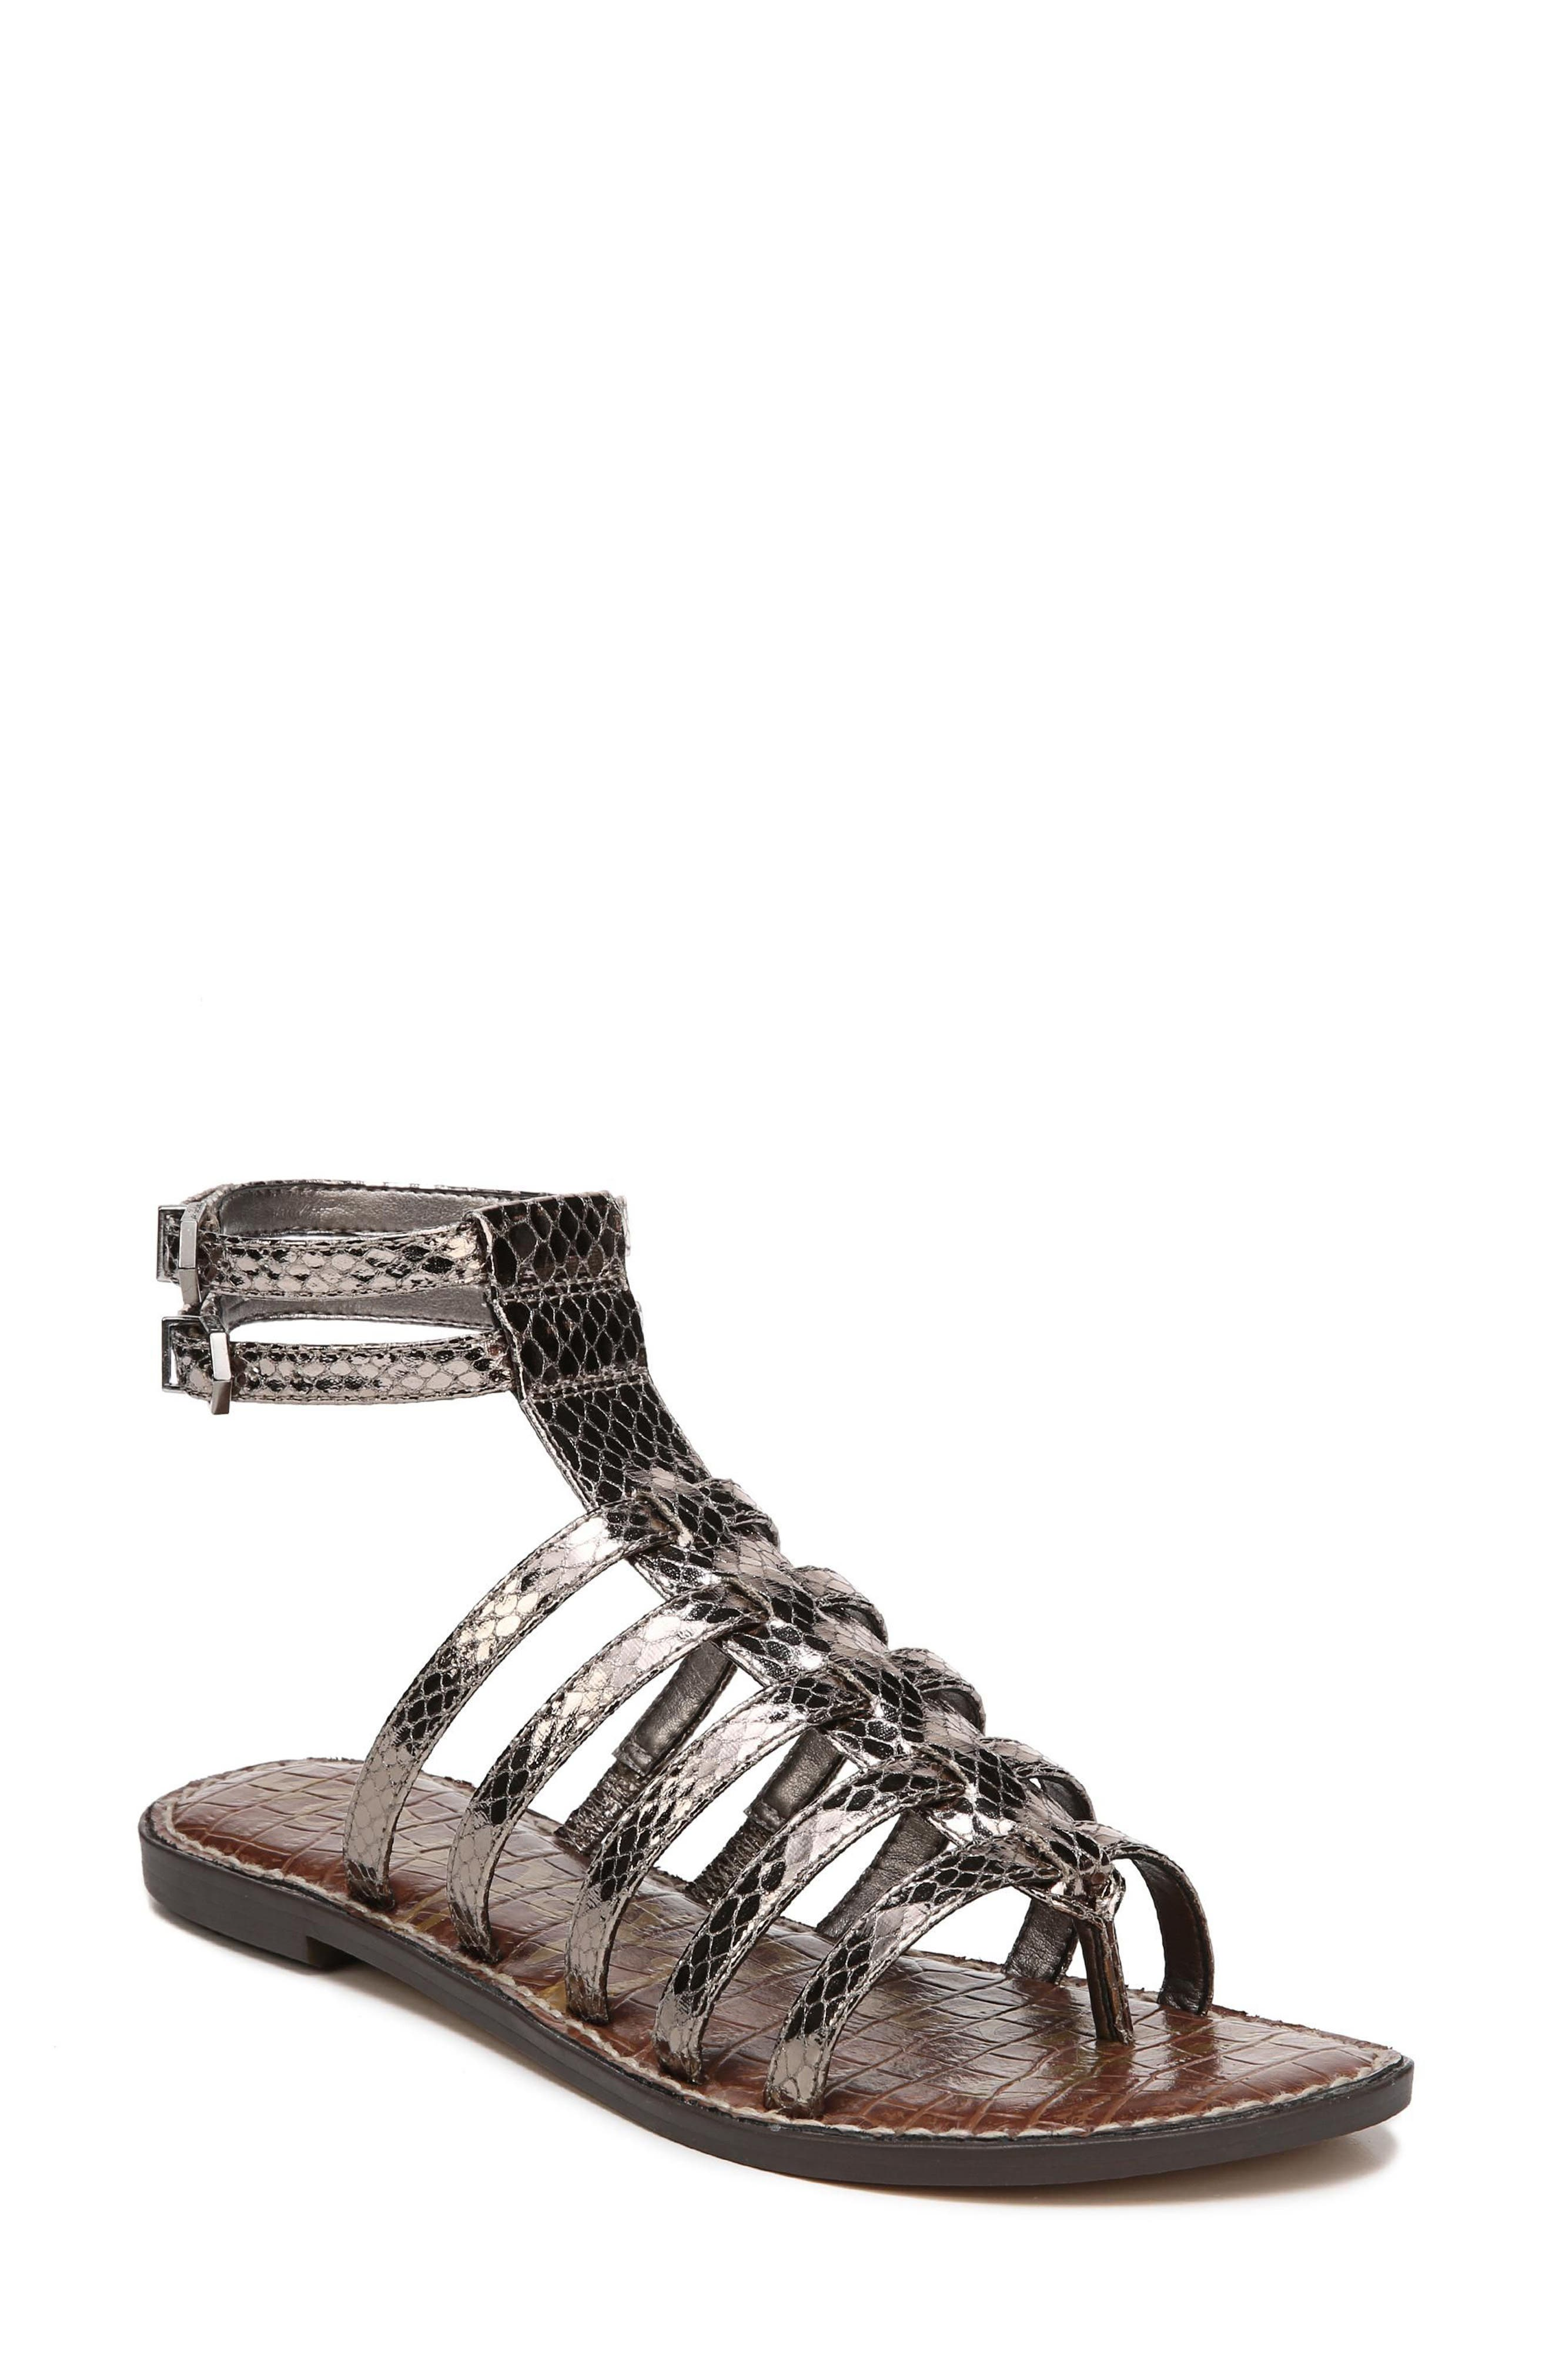 Sam Edelman Gilda Gladiator Sandal